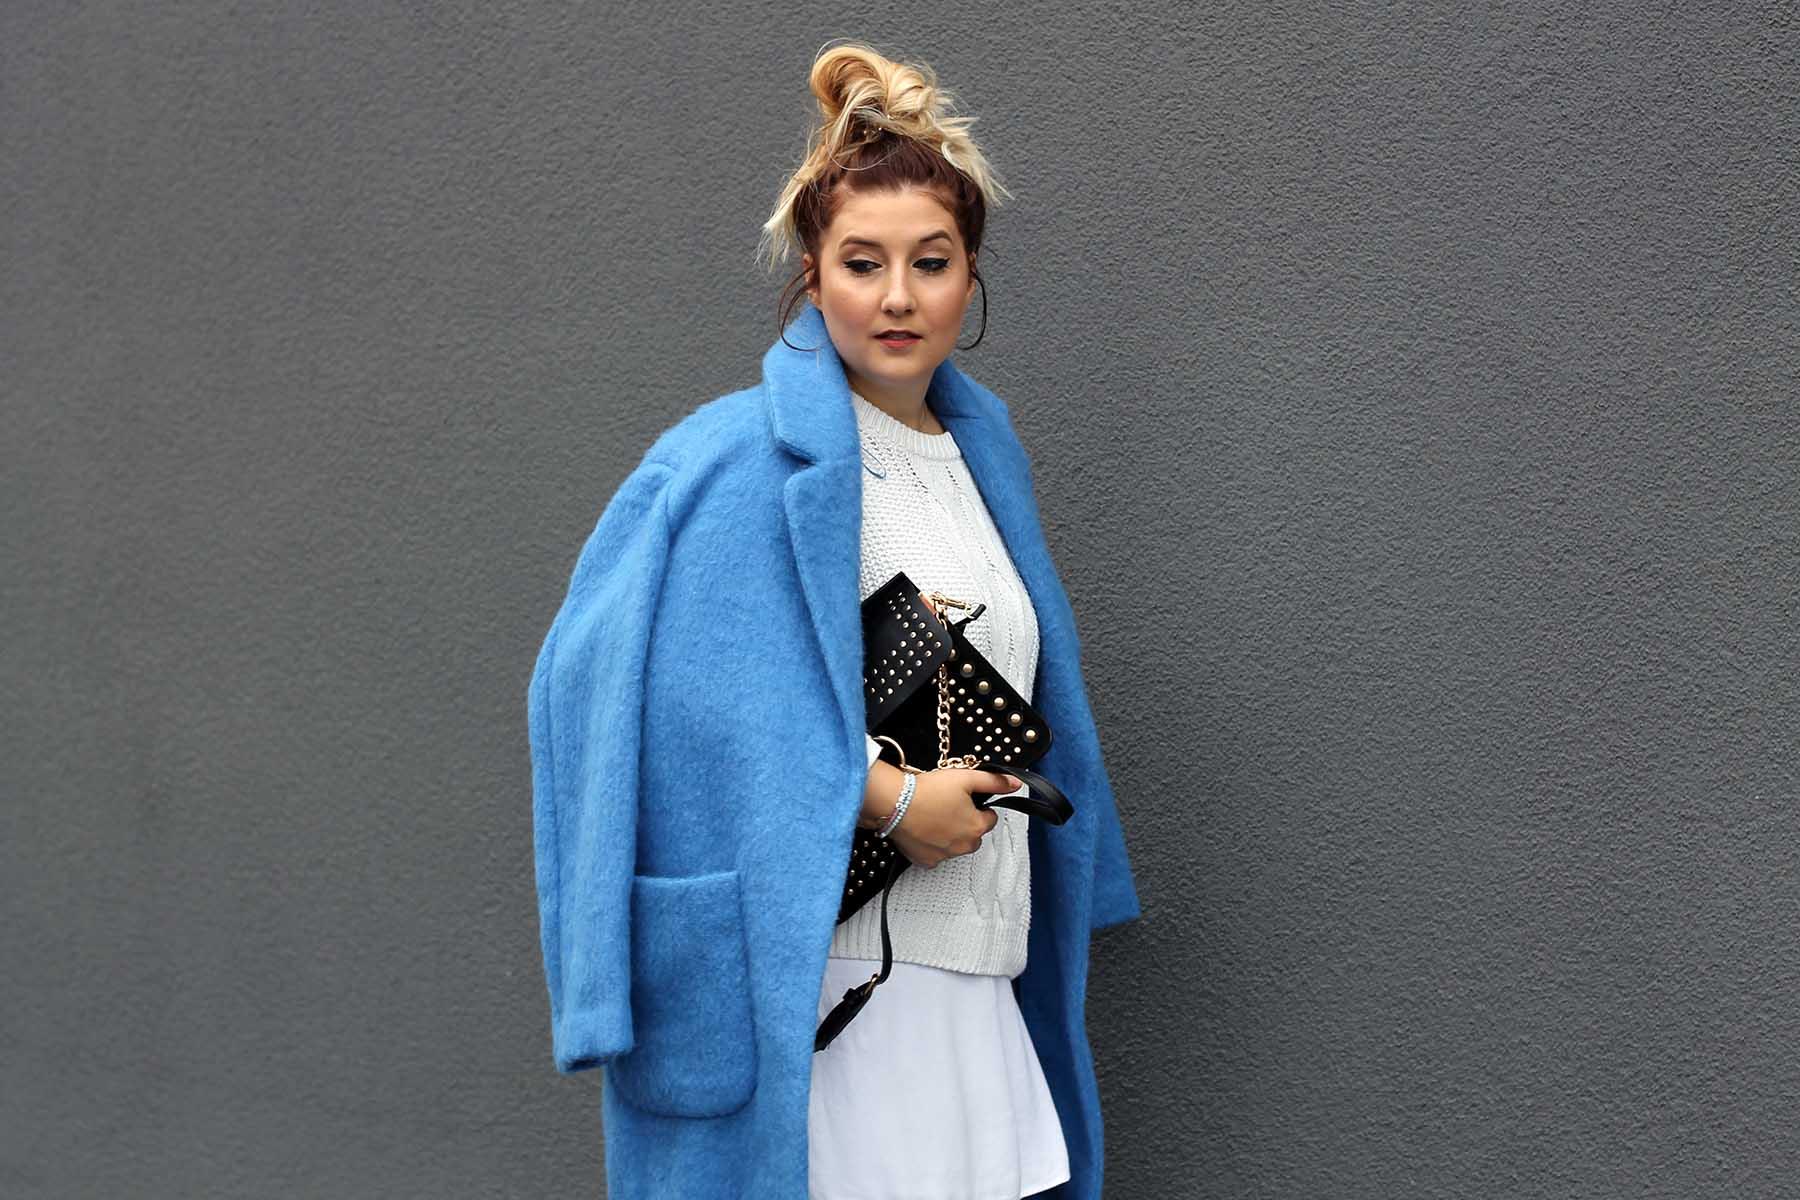 outfit-look-style-modeblog-fashionblog-blauer-mantel-jeans-balenciaga-lookalike-boots-chloe29